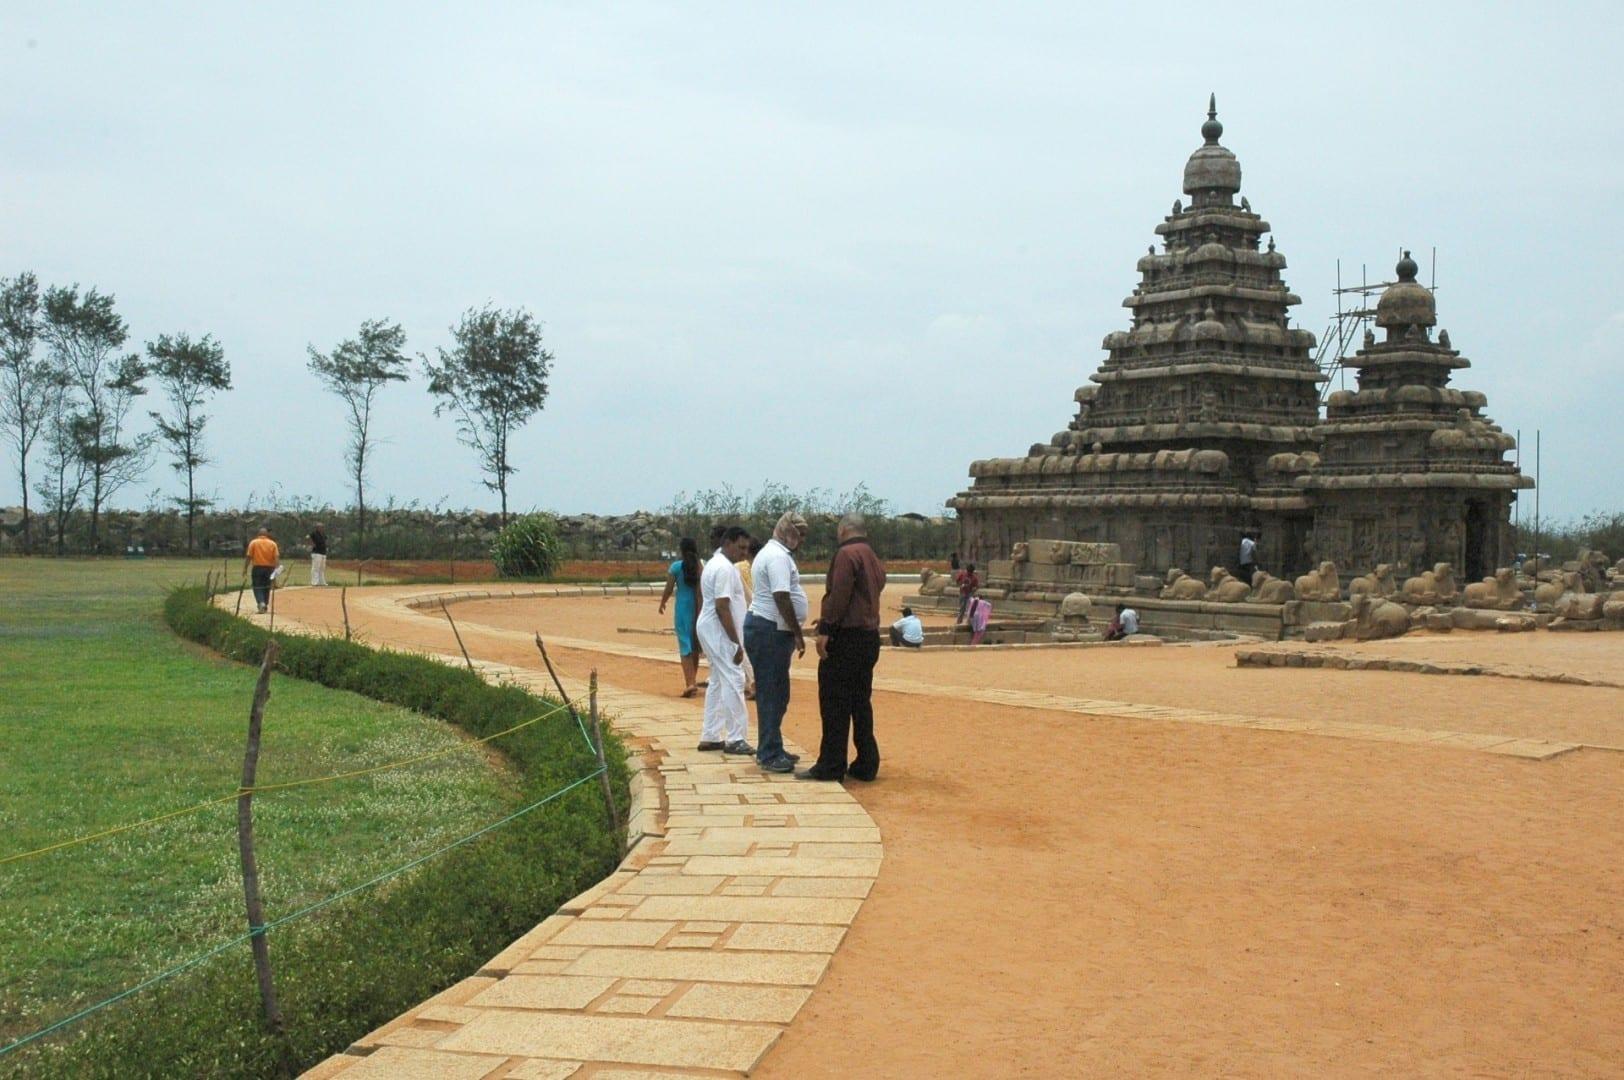 Acercándose al Templo de la Orilla Mamallapuram-Mahabalipuram India